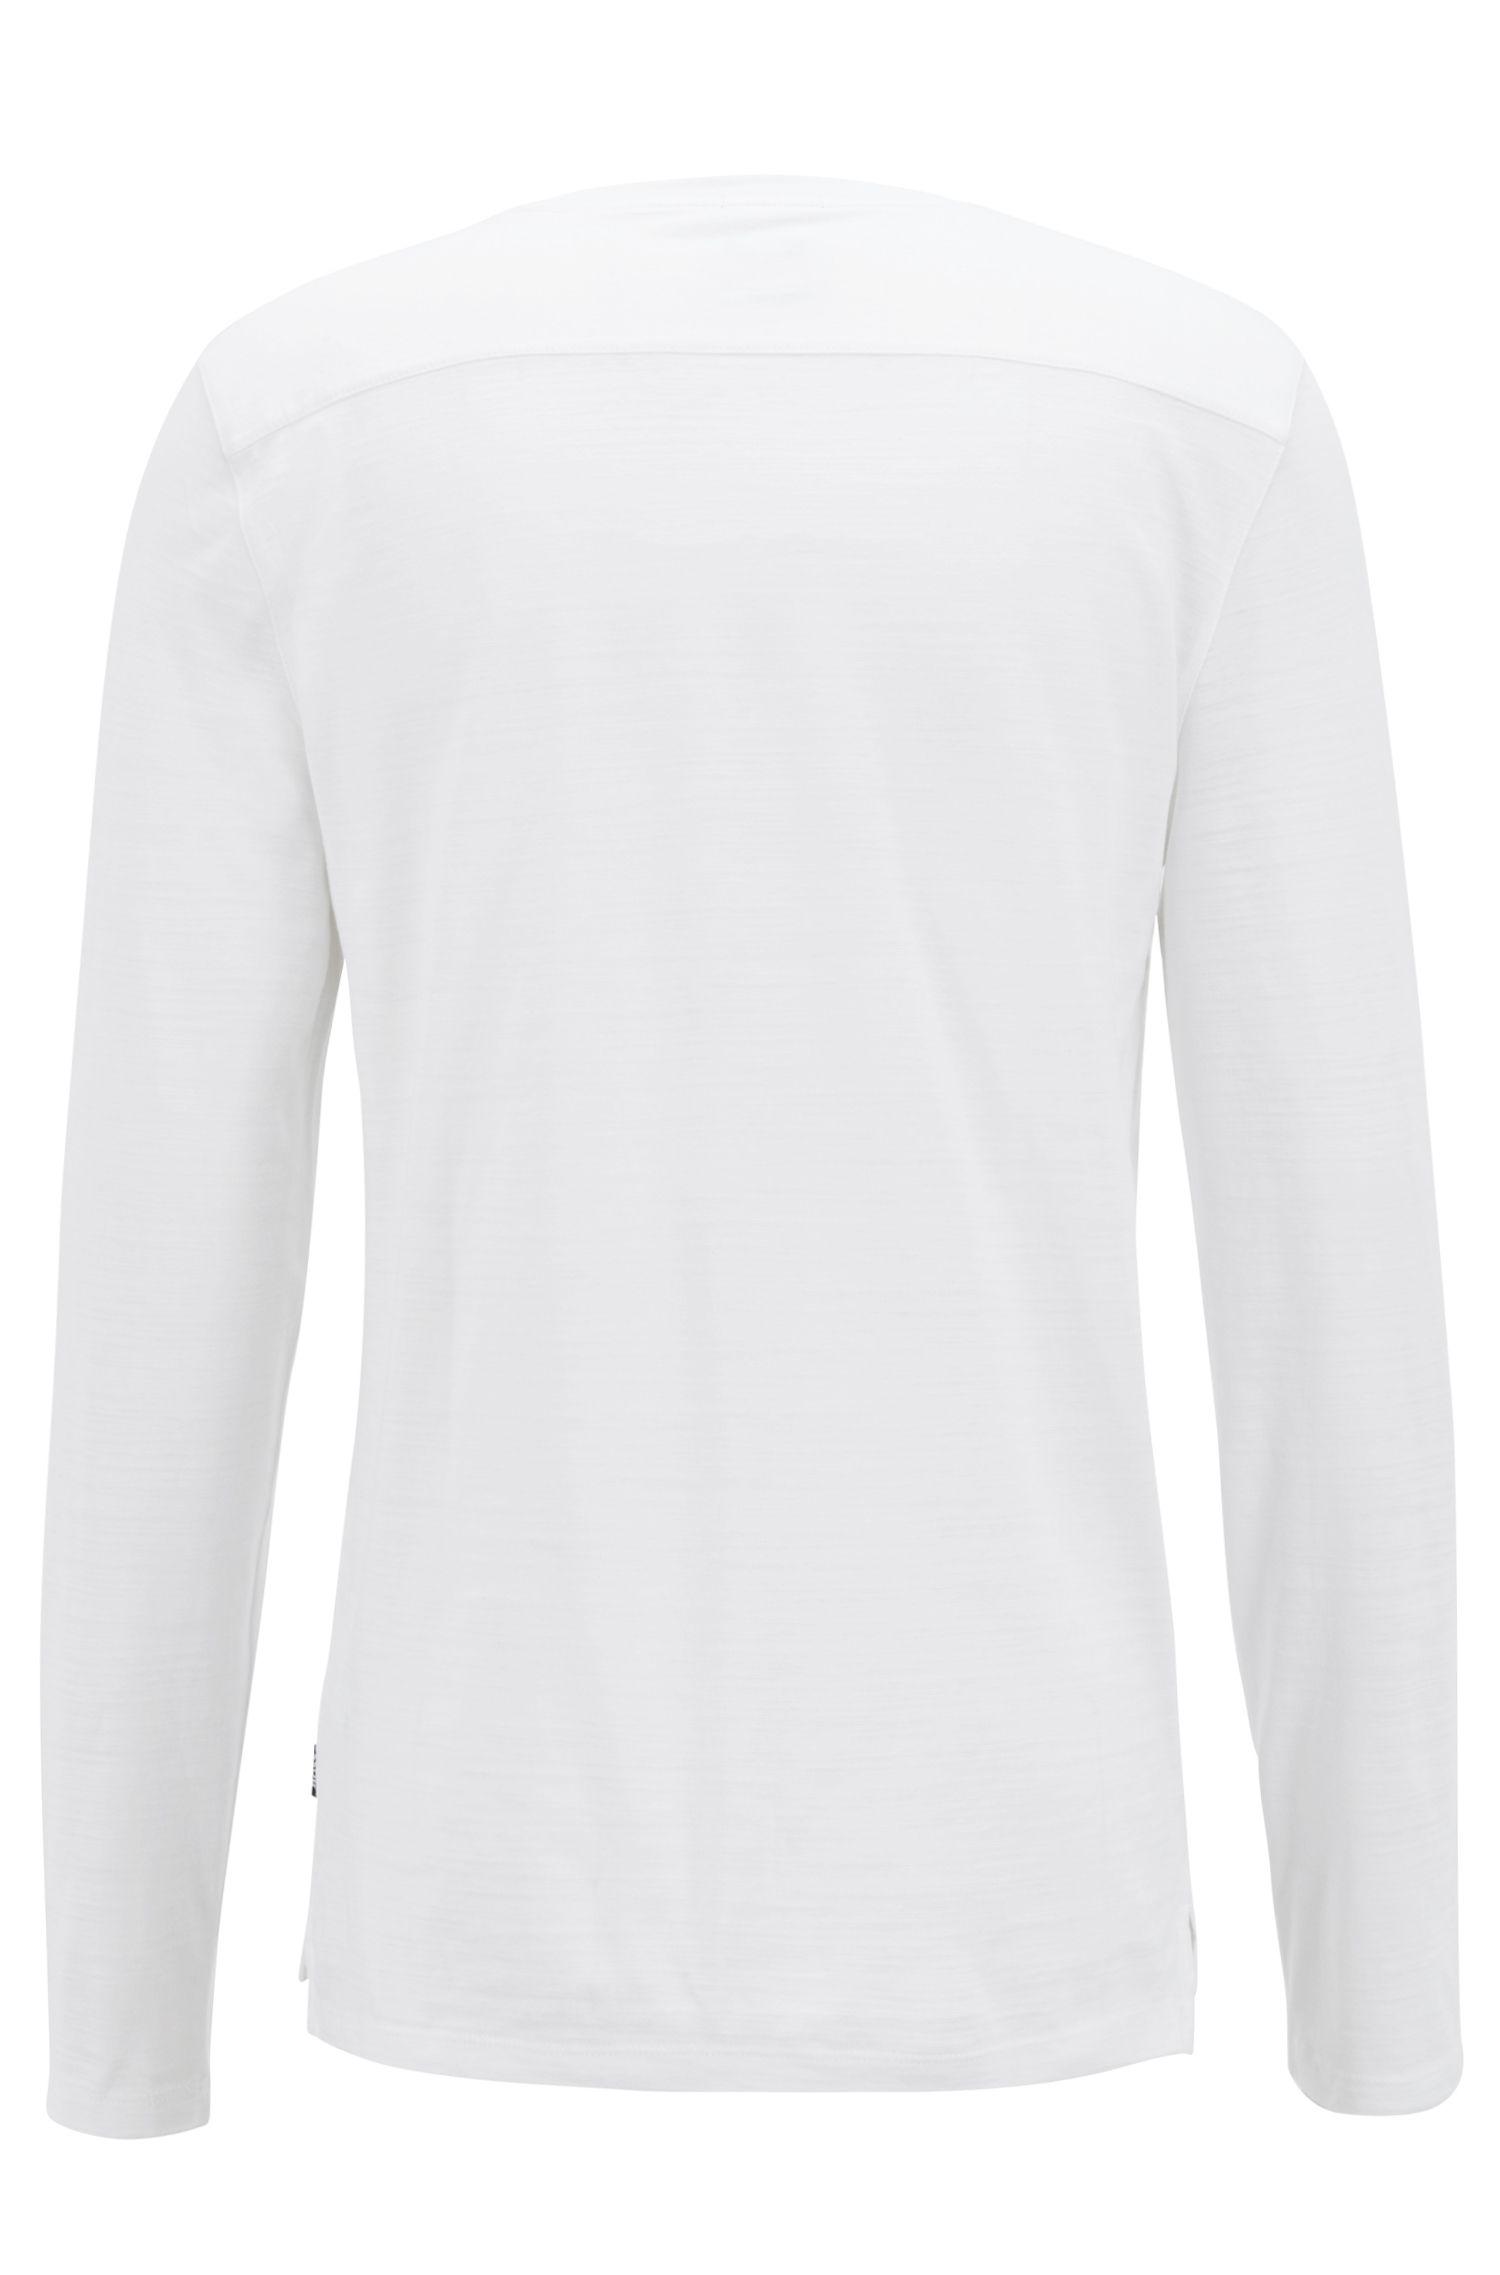 Camiseta regular fit de manga larga en algodón flameado mercerizado, Blanco